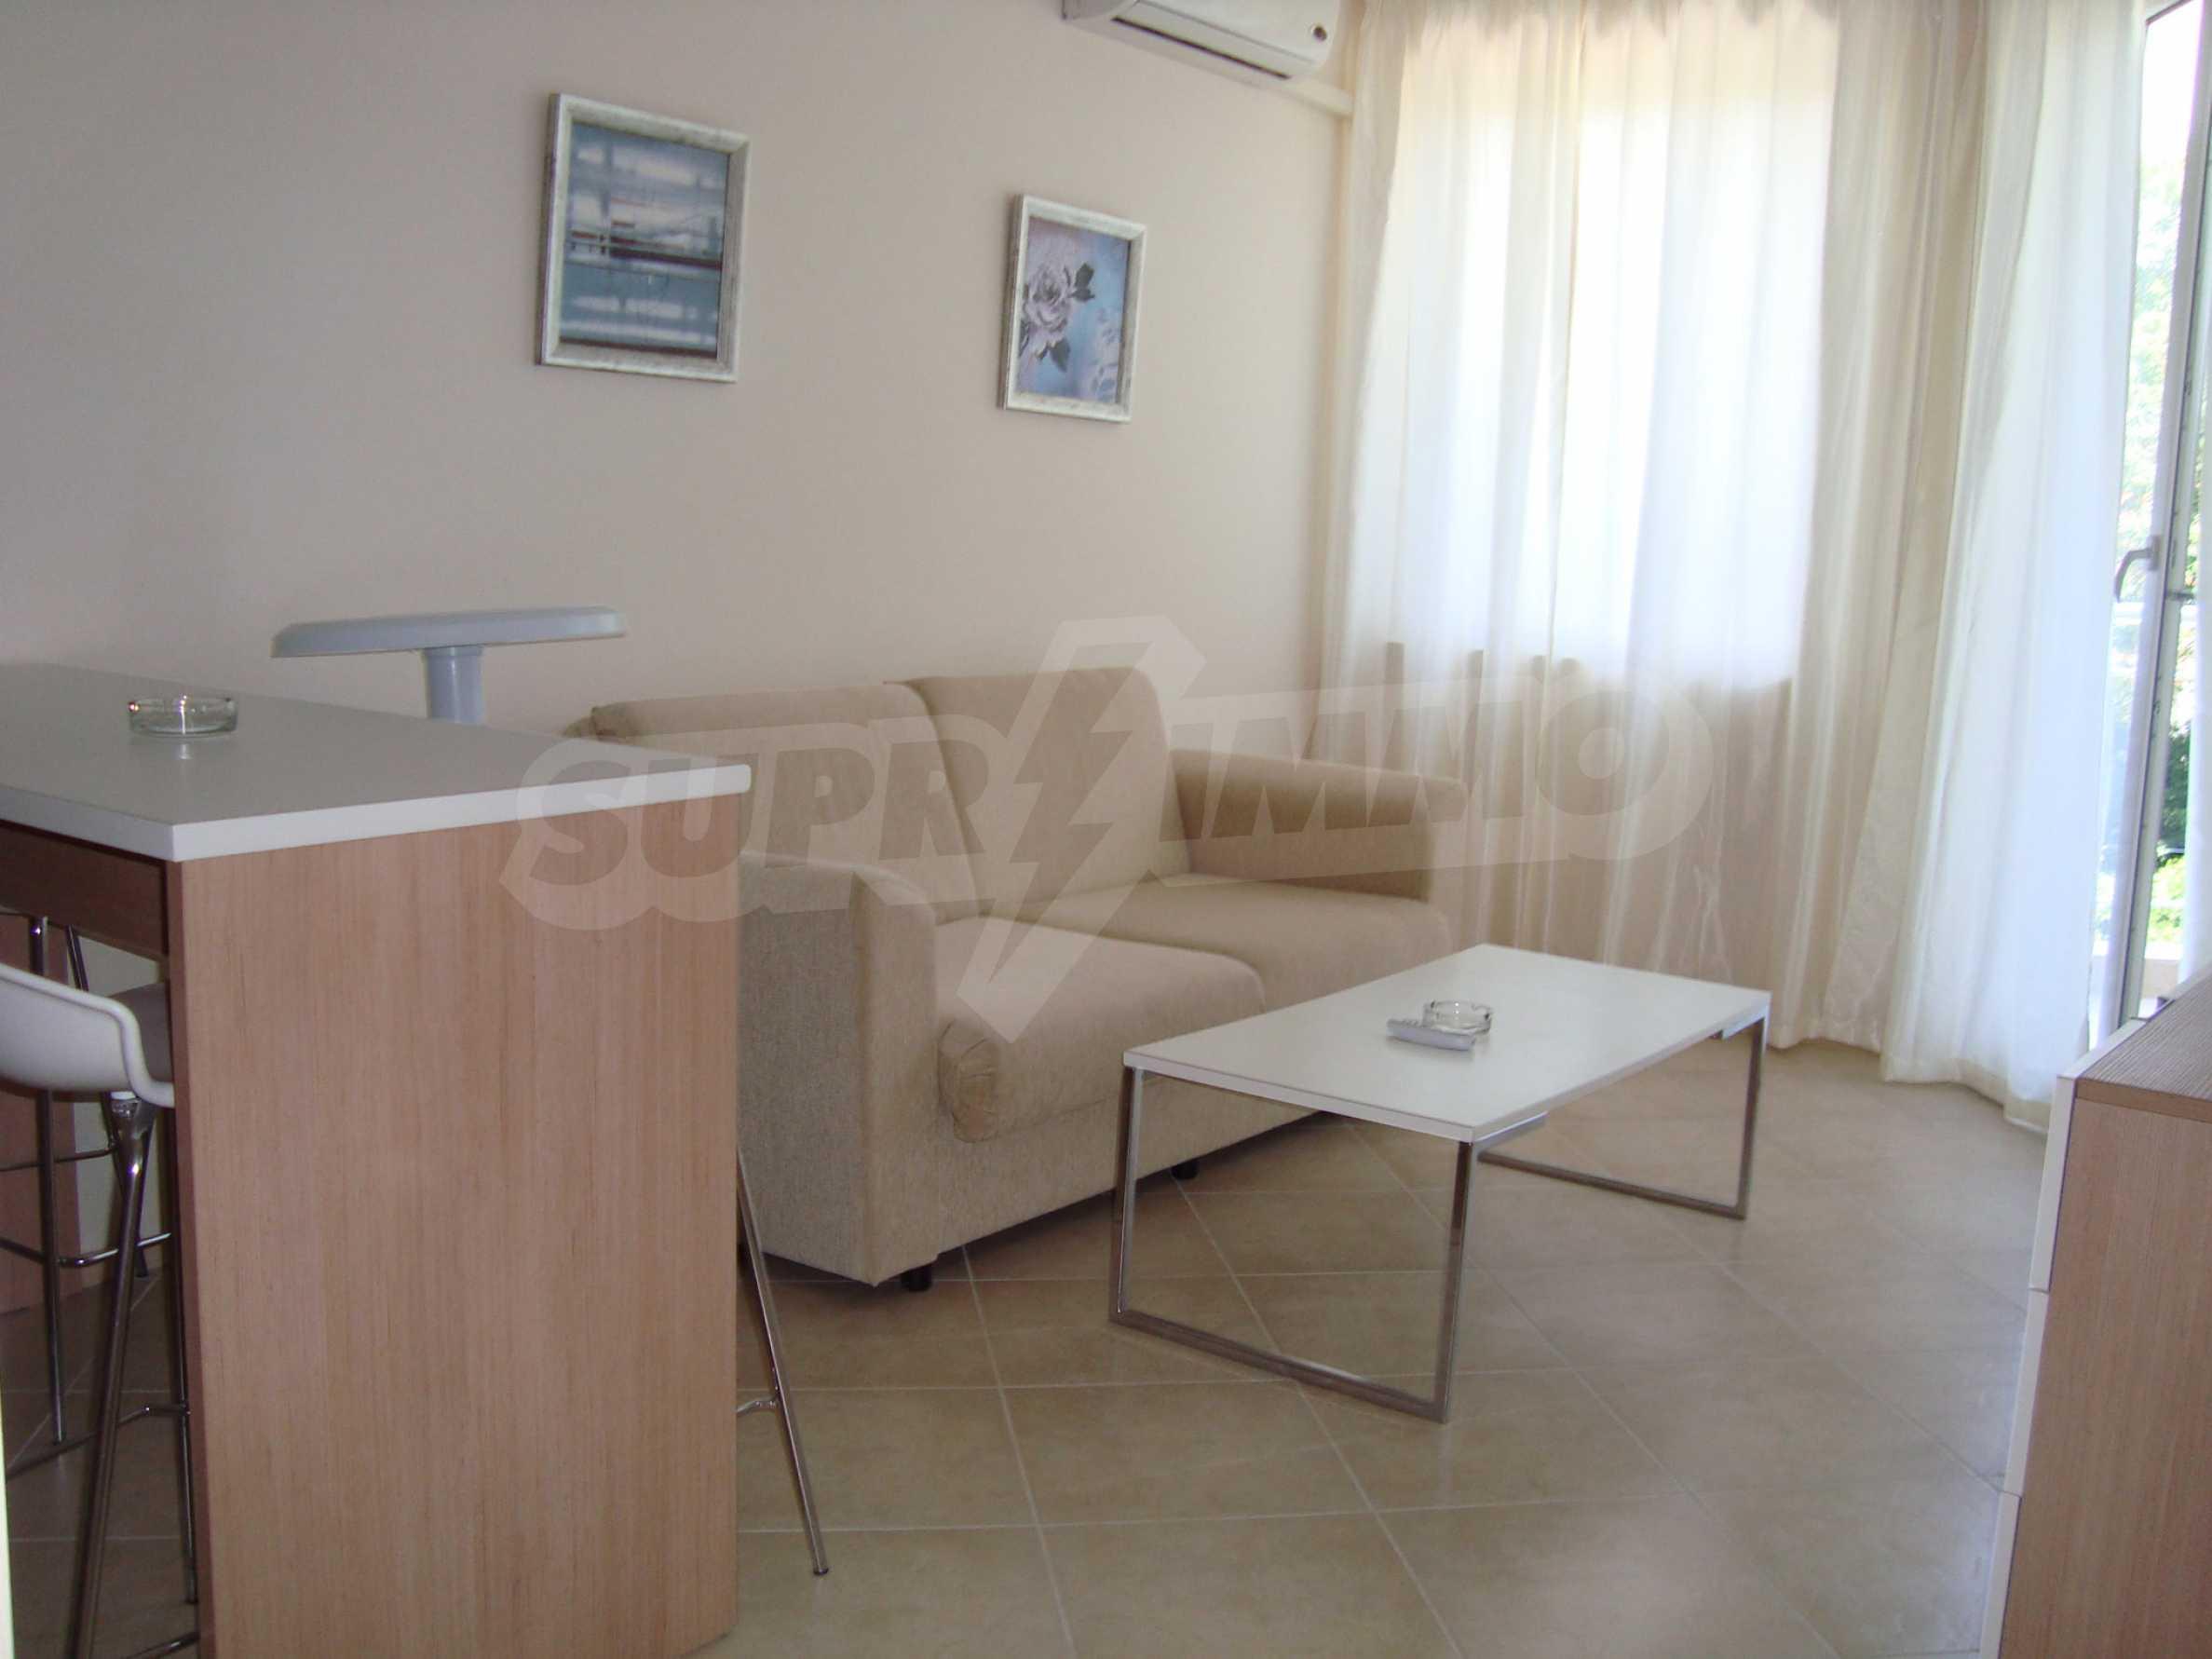 1-bedroom apartment in Emberli complex in Lozenets 2